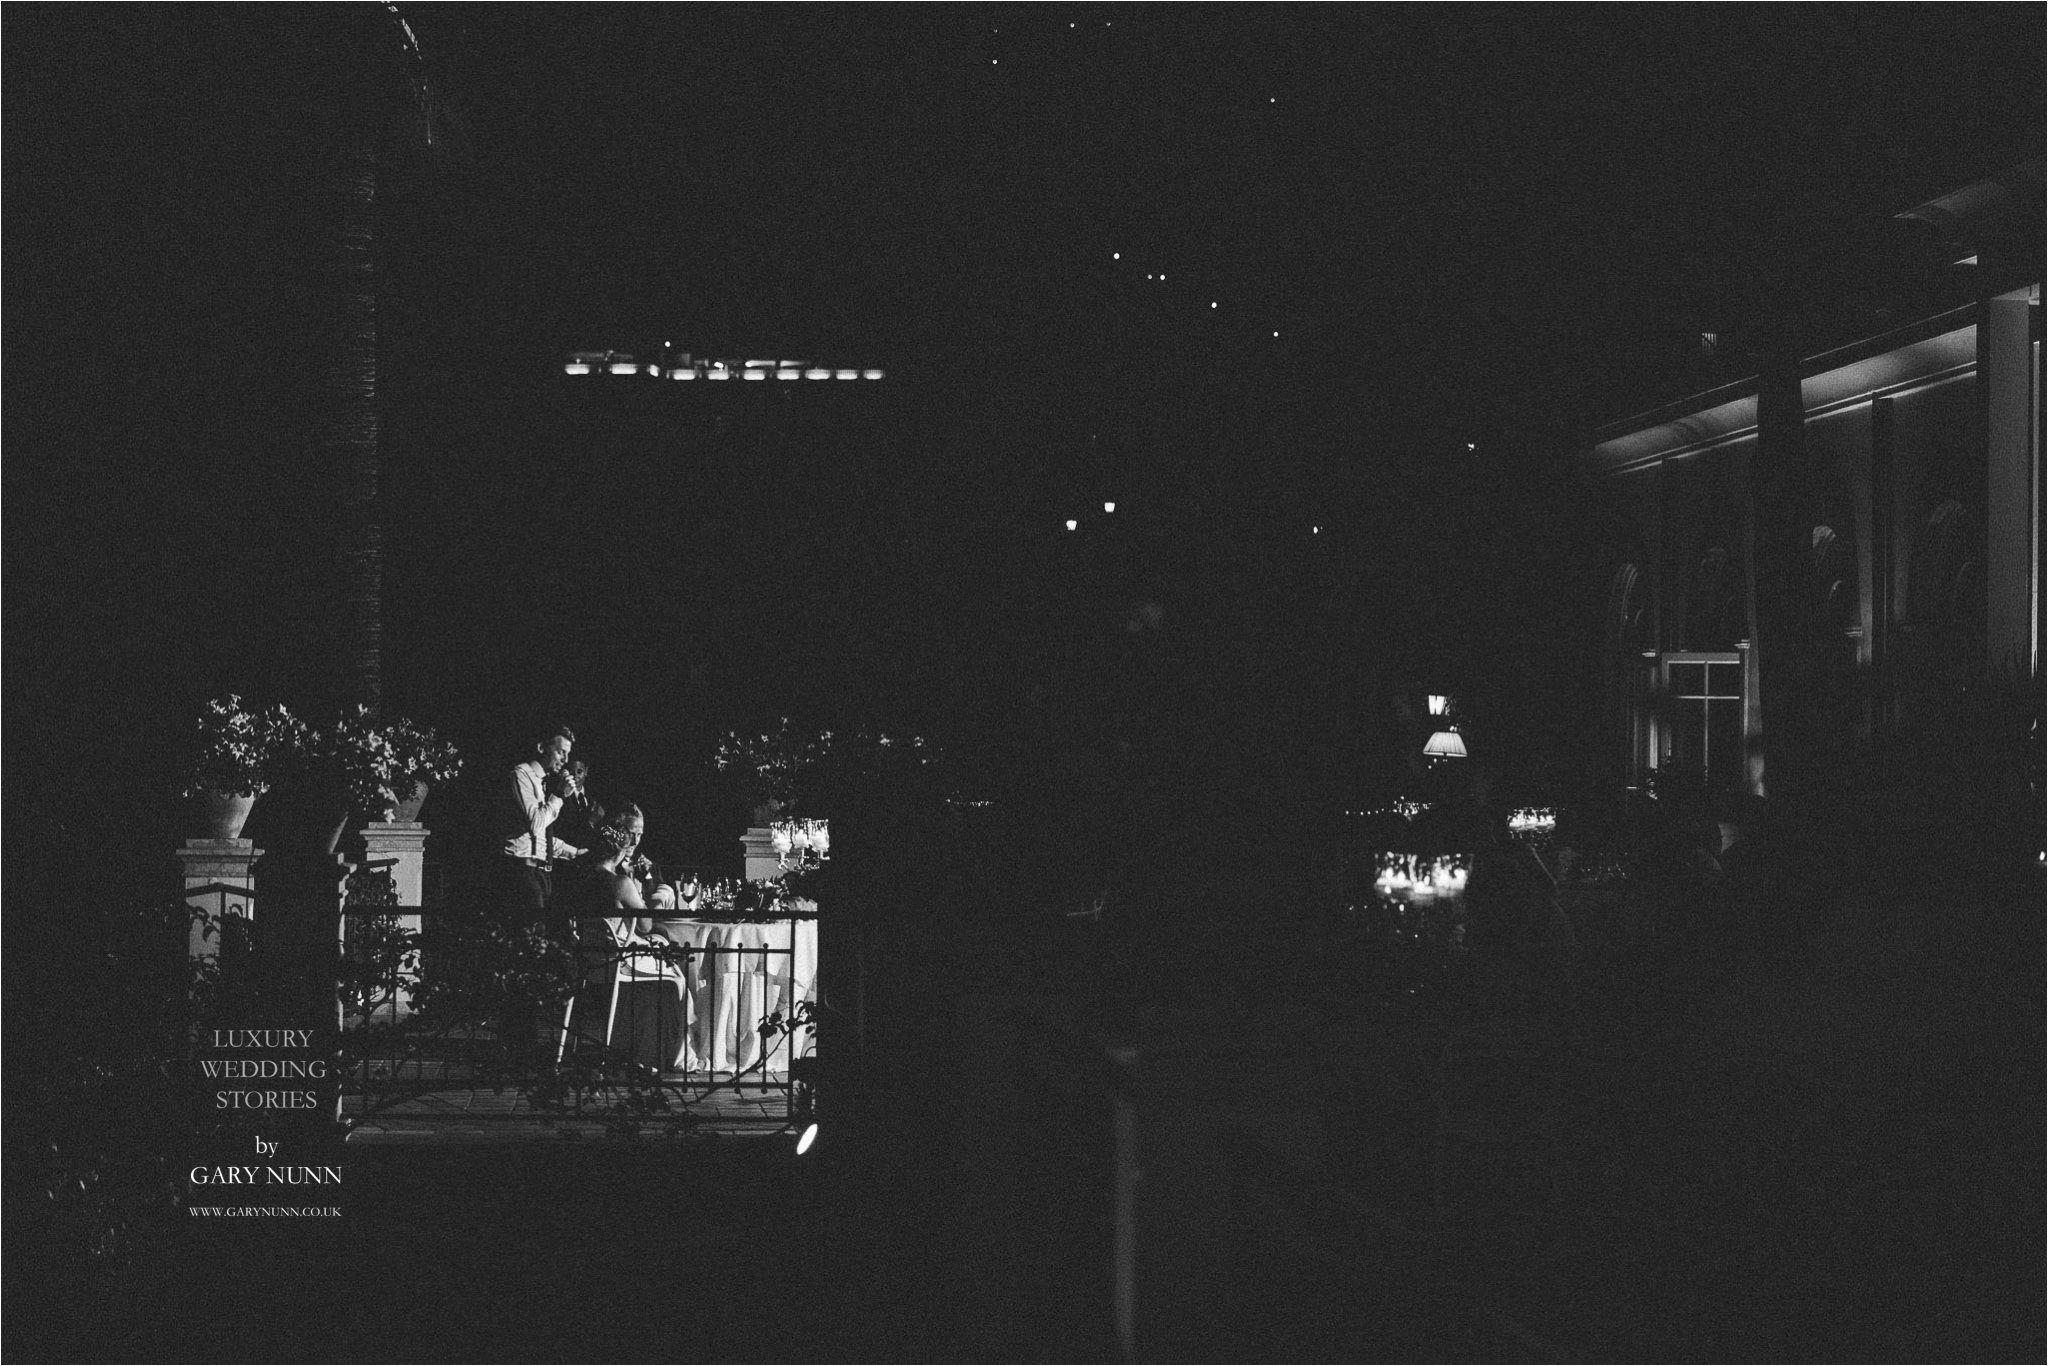 essential wedding photos, best man speech, belmond grand hotel timeo, destination wedding photographer italy, Gary Nunn Photography, grand hotel timeo, mount etna, sicily, sicily wedding photography, top 10 wedding photographers, wedding photograpgher leighton buzzard, weddings in Taormina